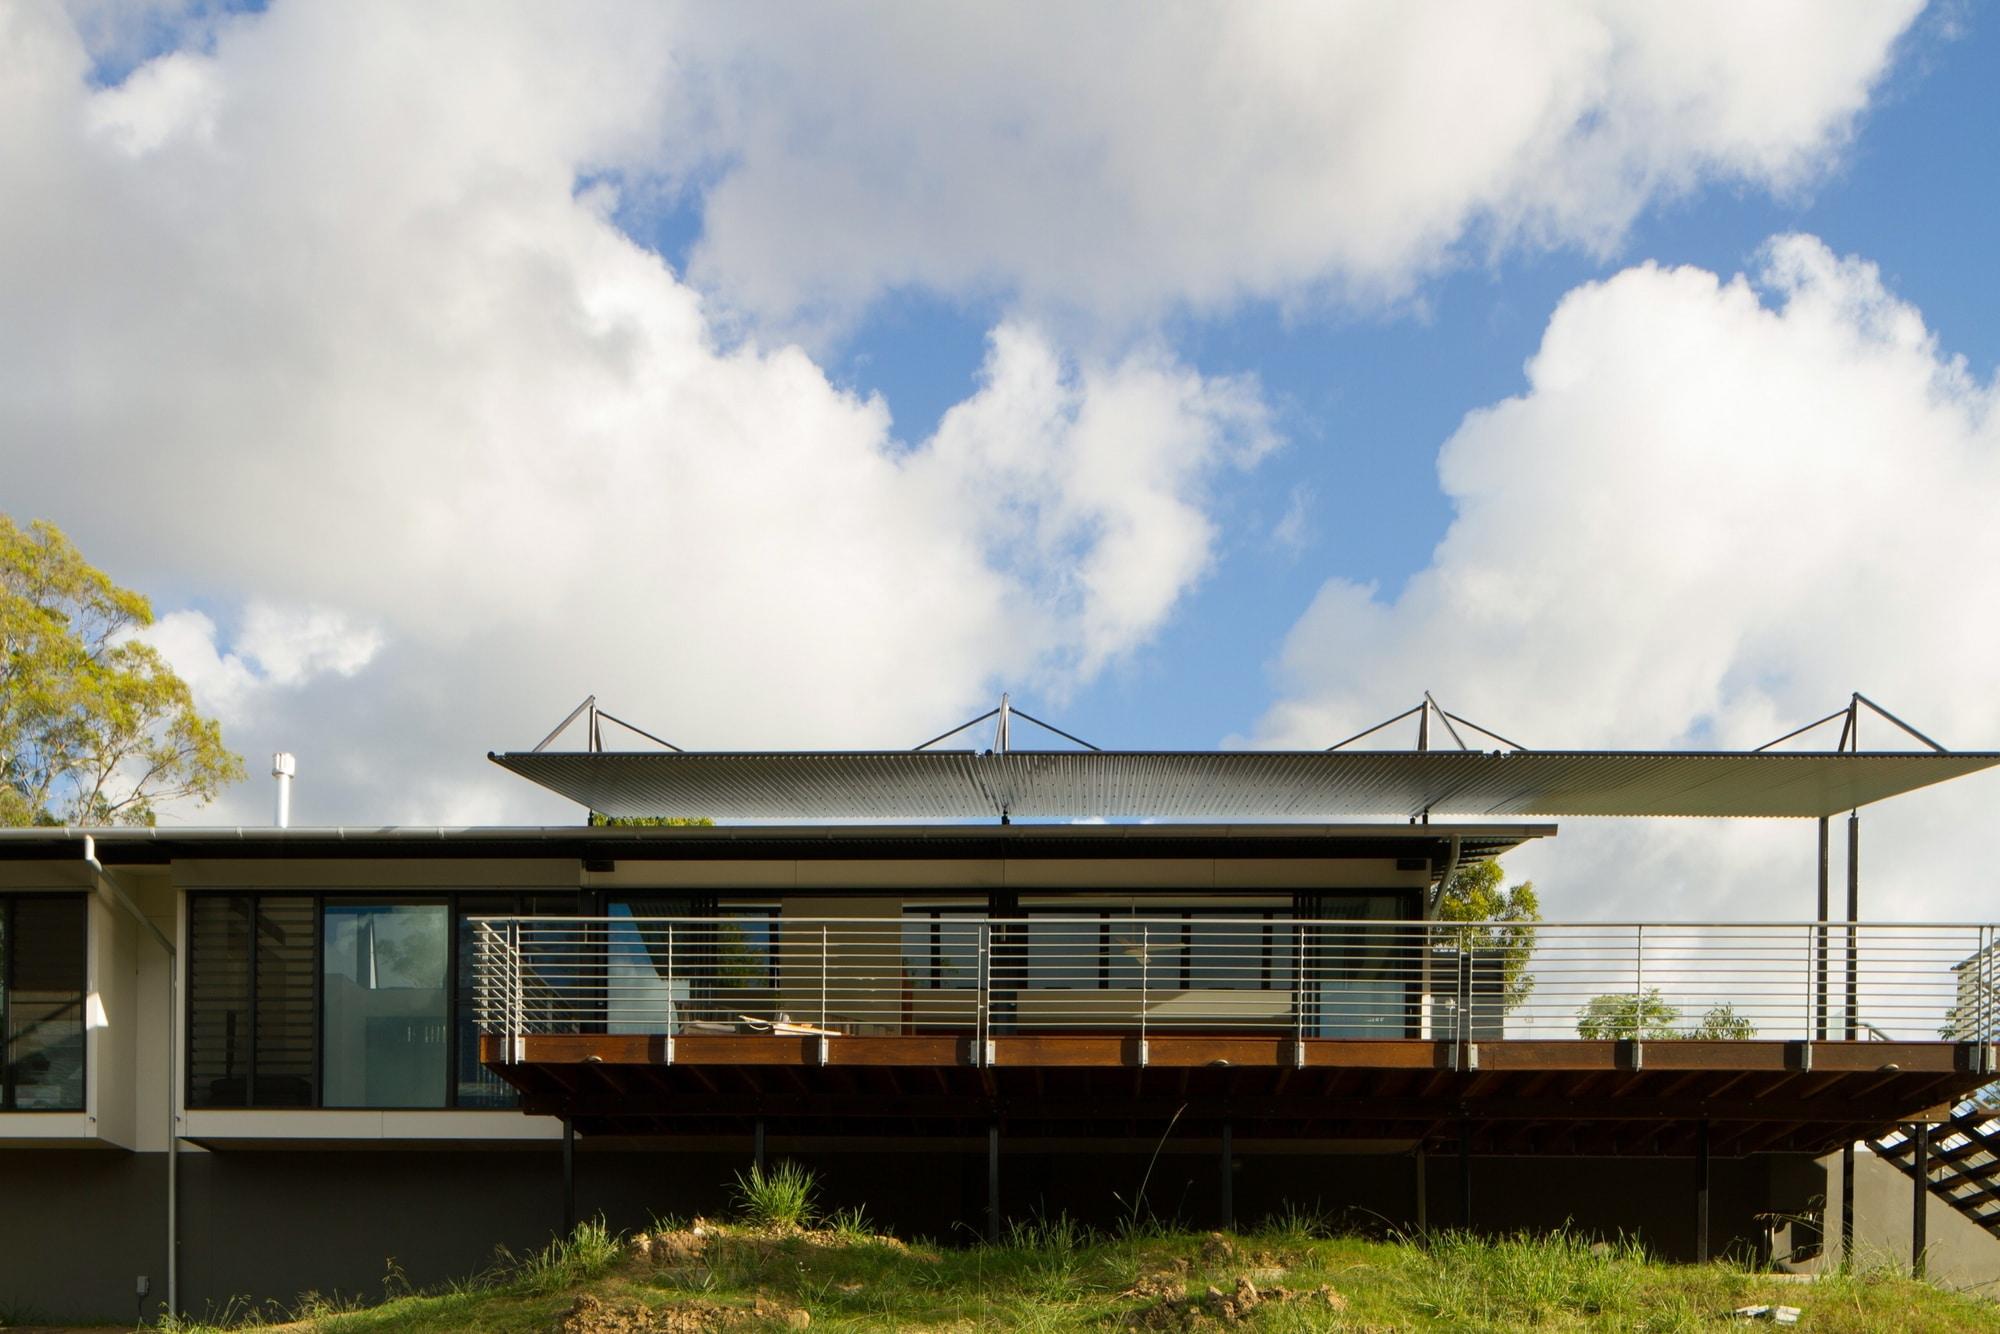 Dise o de casa moderna en terreno largo y angosto for Diseno de apartamentos de 45m2